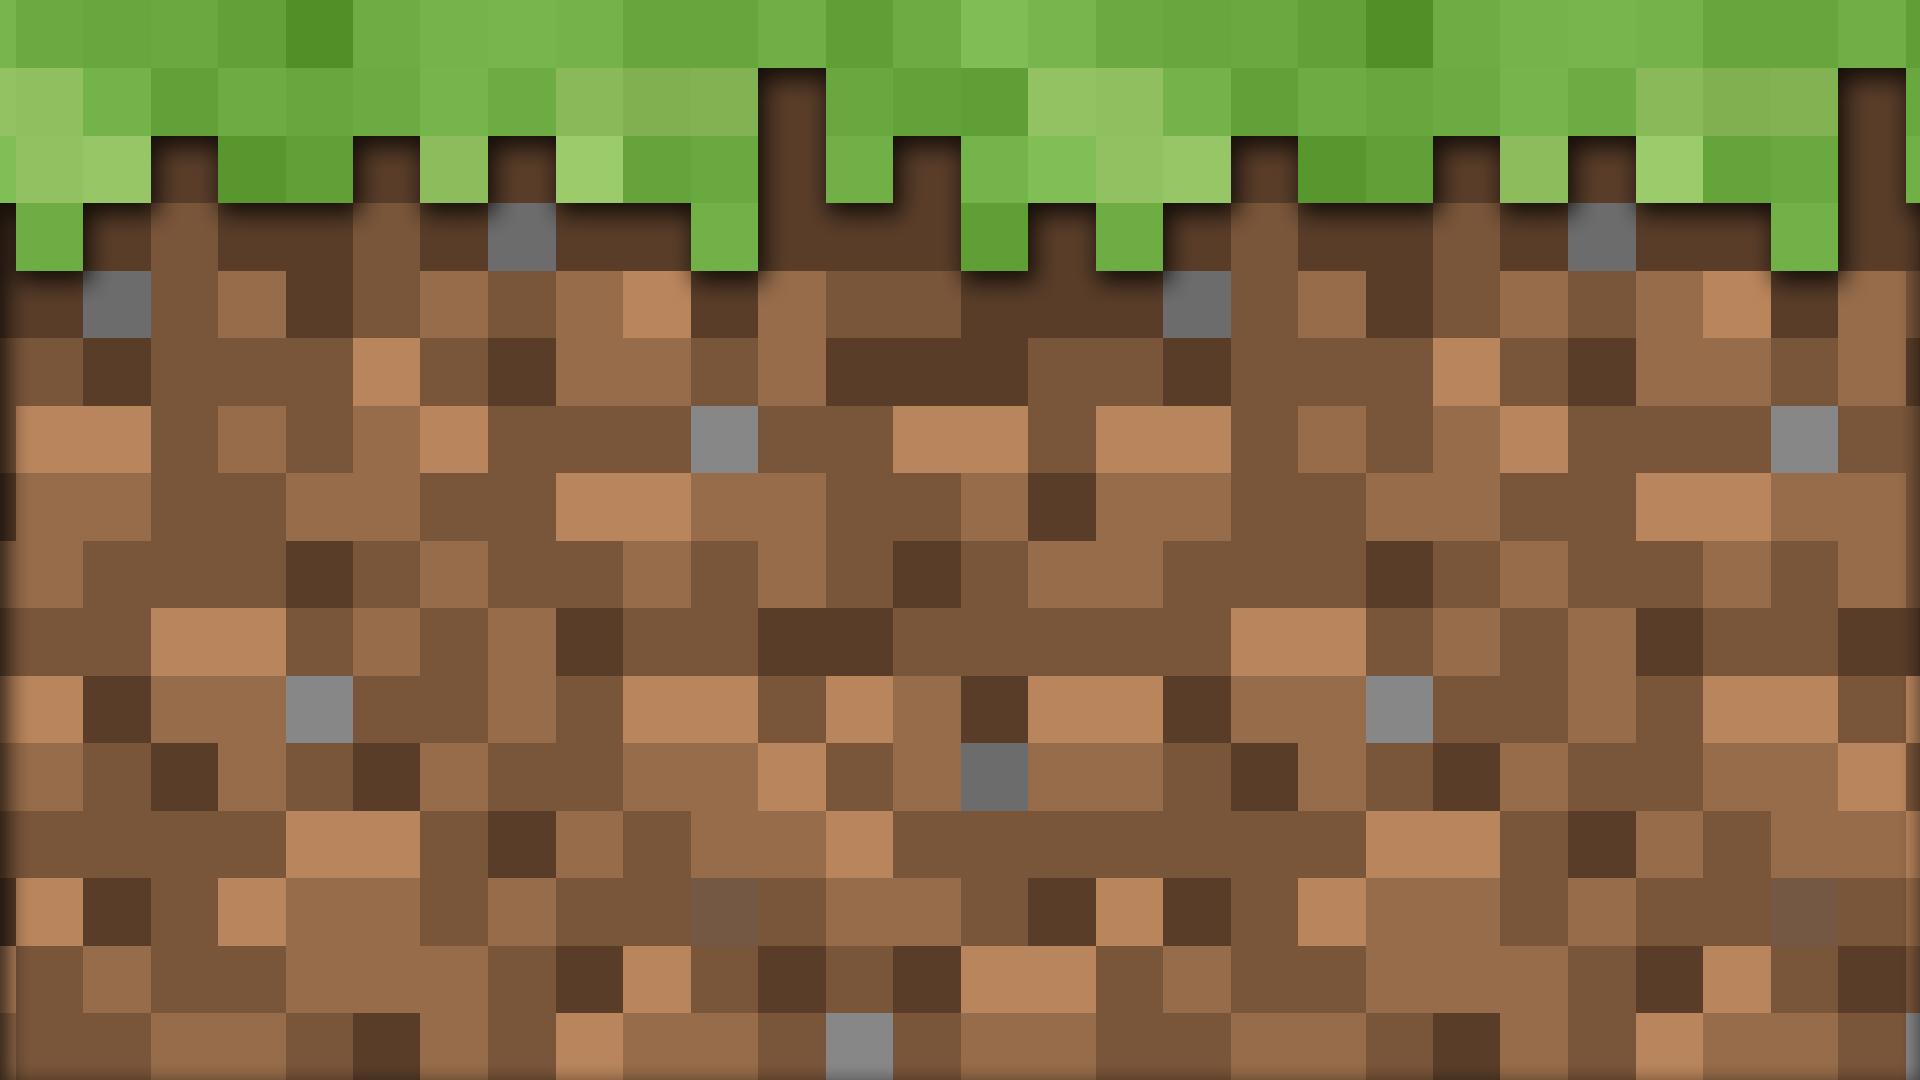 Minecraft Emerald Wallpaper Minecraft grass wallpaper